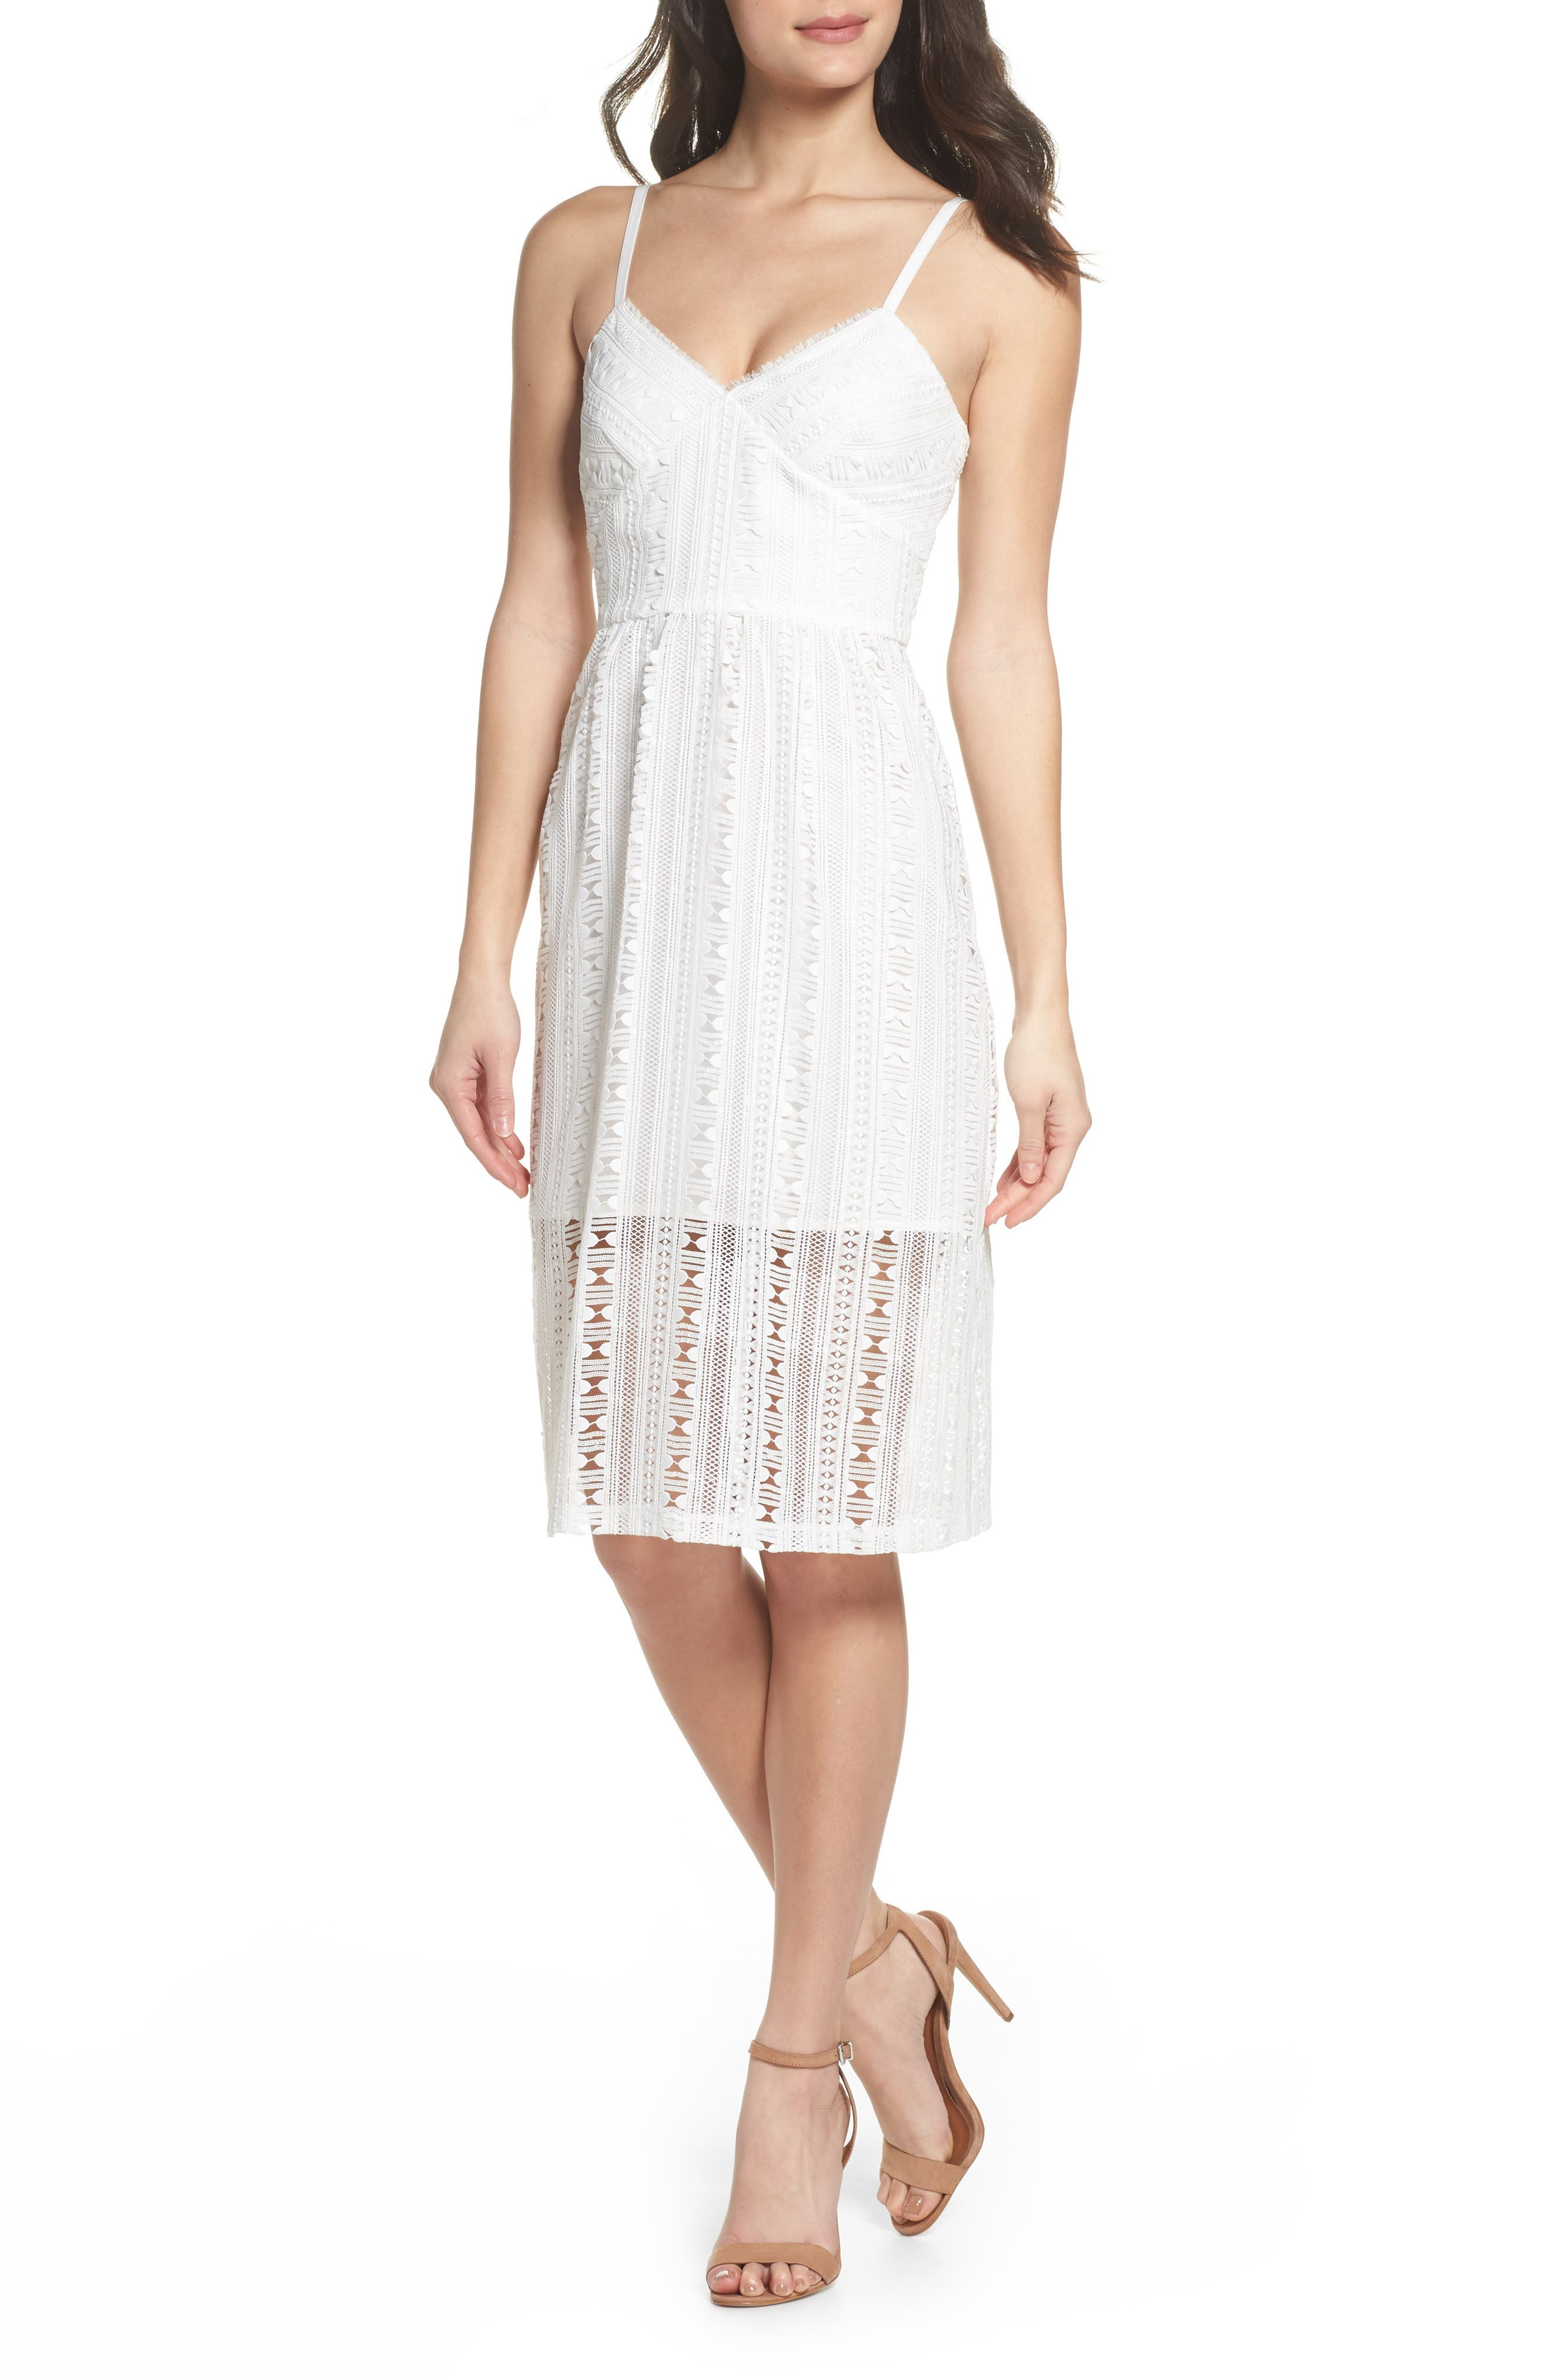 Belissimo Lace Fit & Flare Midi Dress,                             Main thumbnail 1, color,                             White